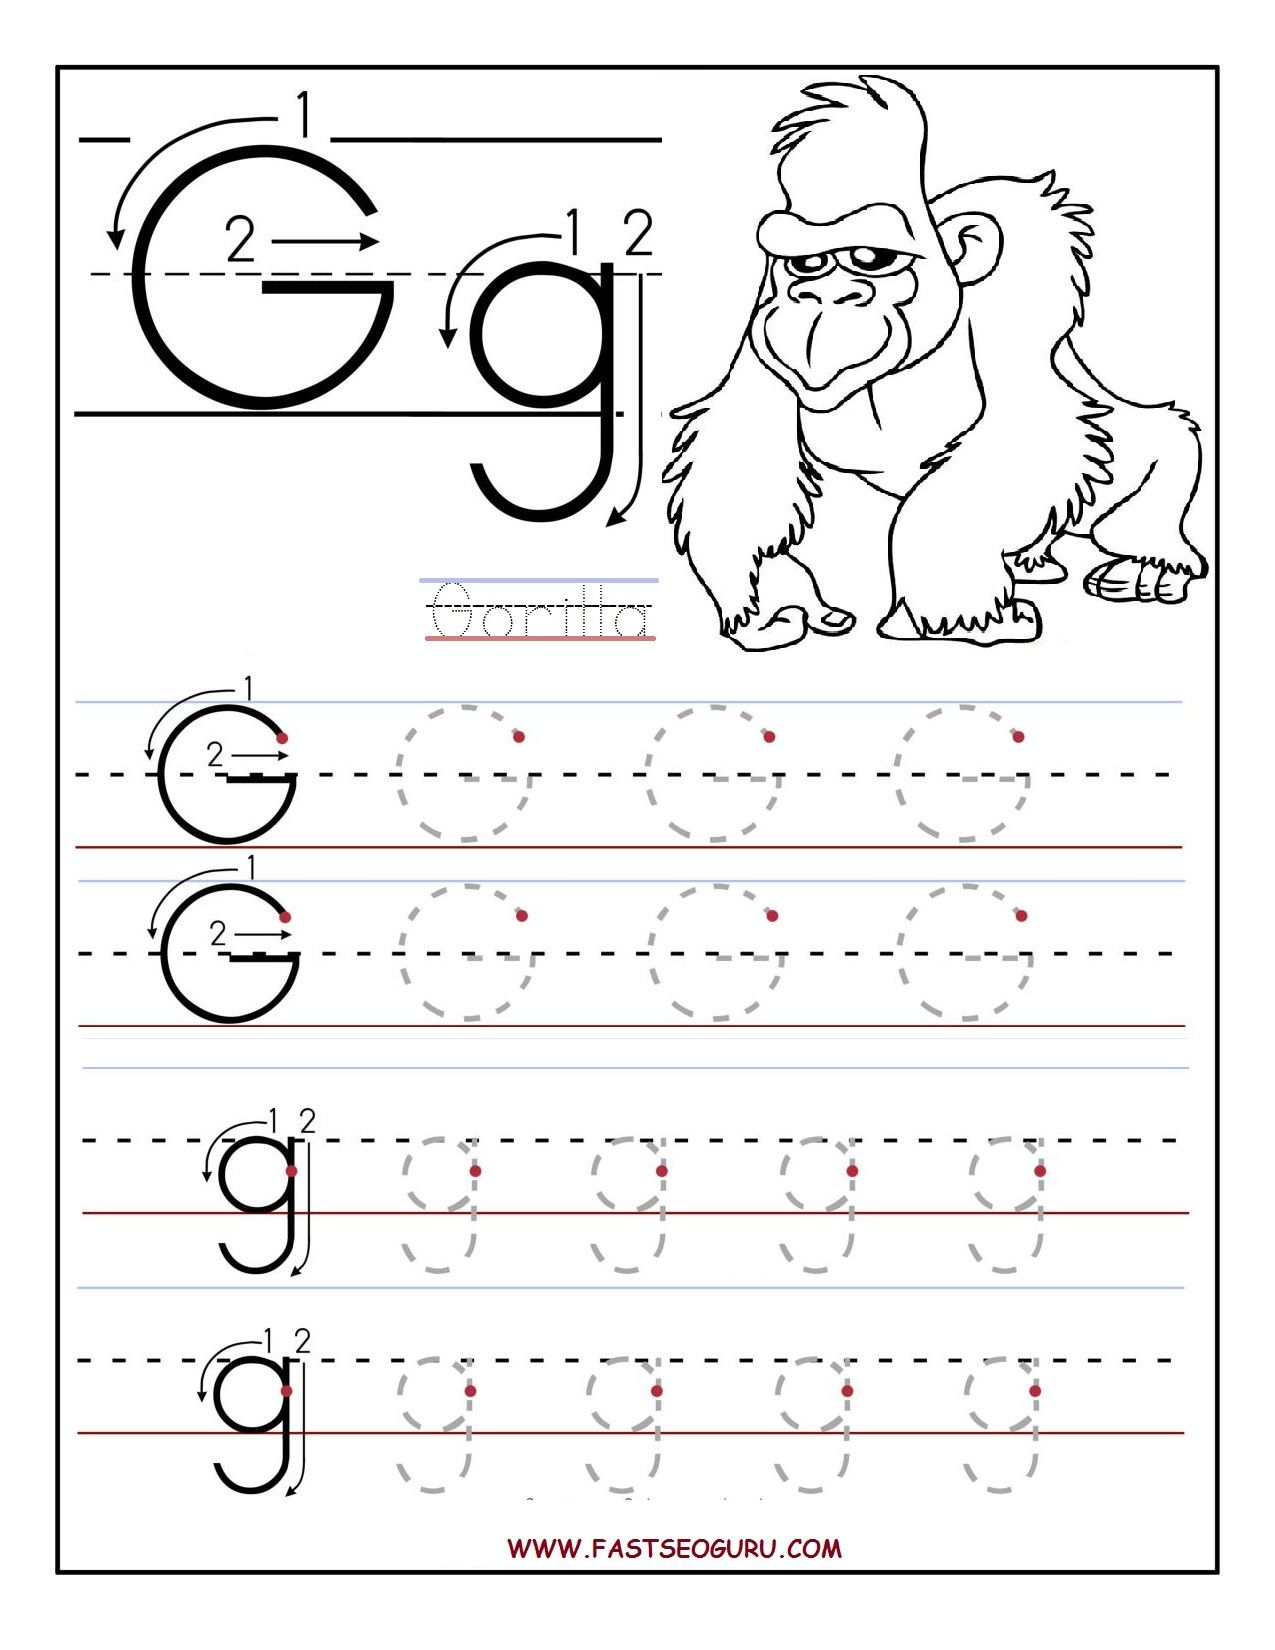 Printable Letter G Tracing Worksheets For Preschool throughout Letter G Tracing Printable